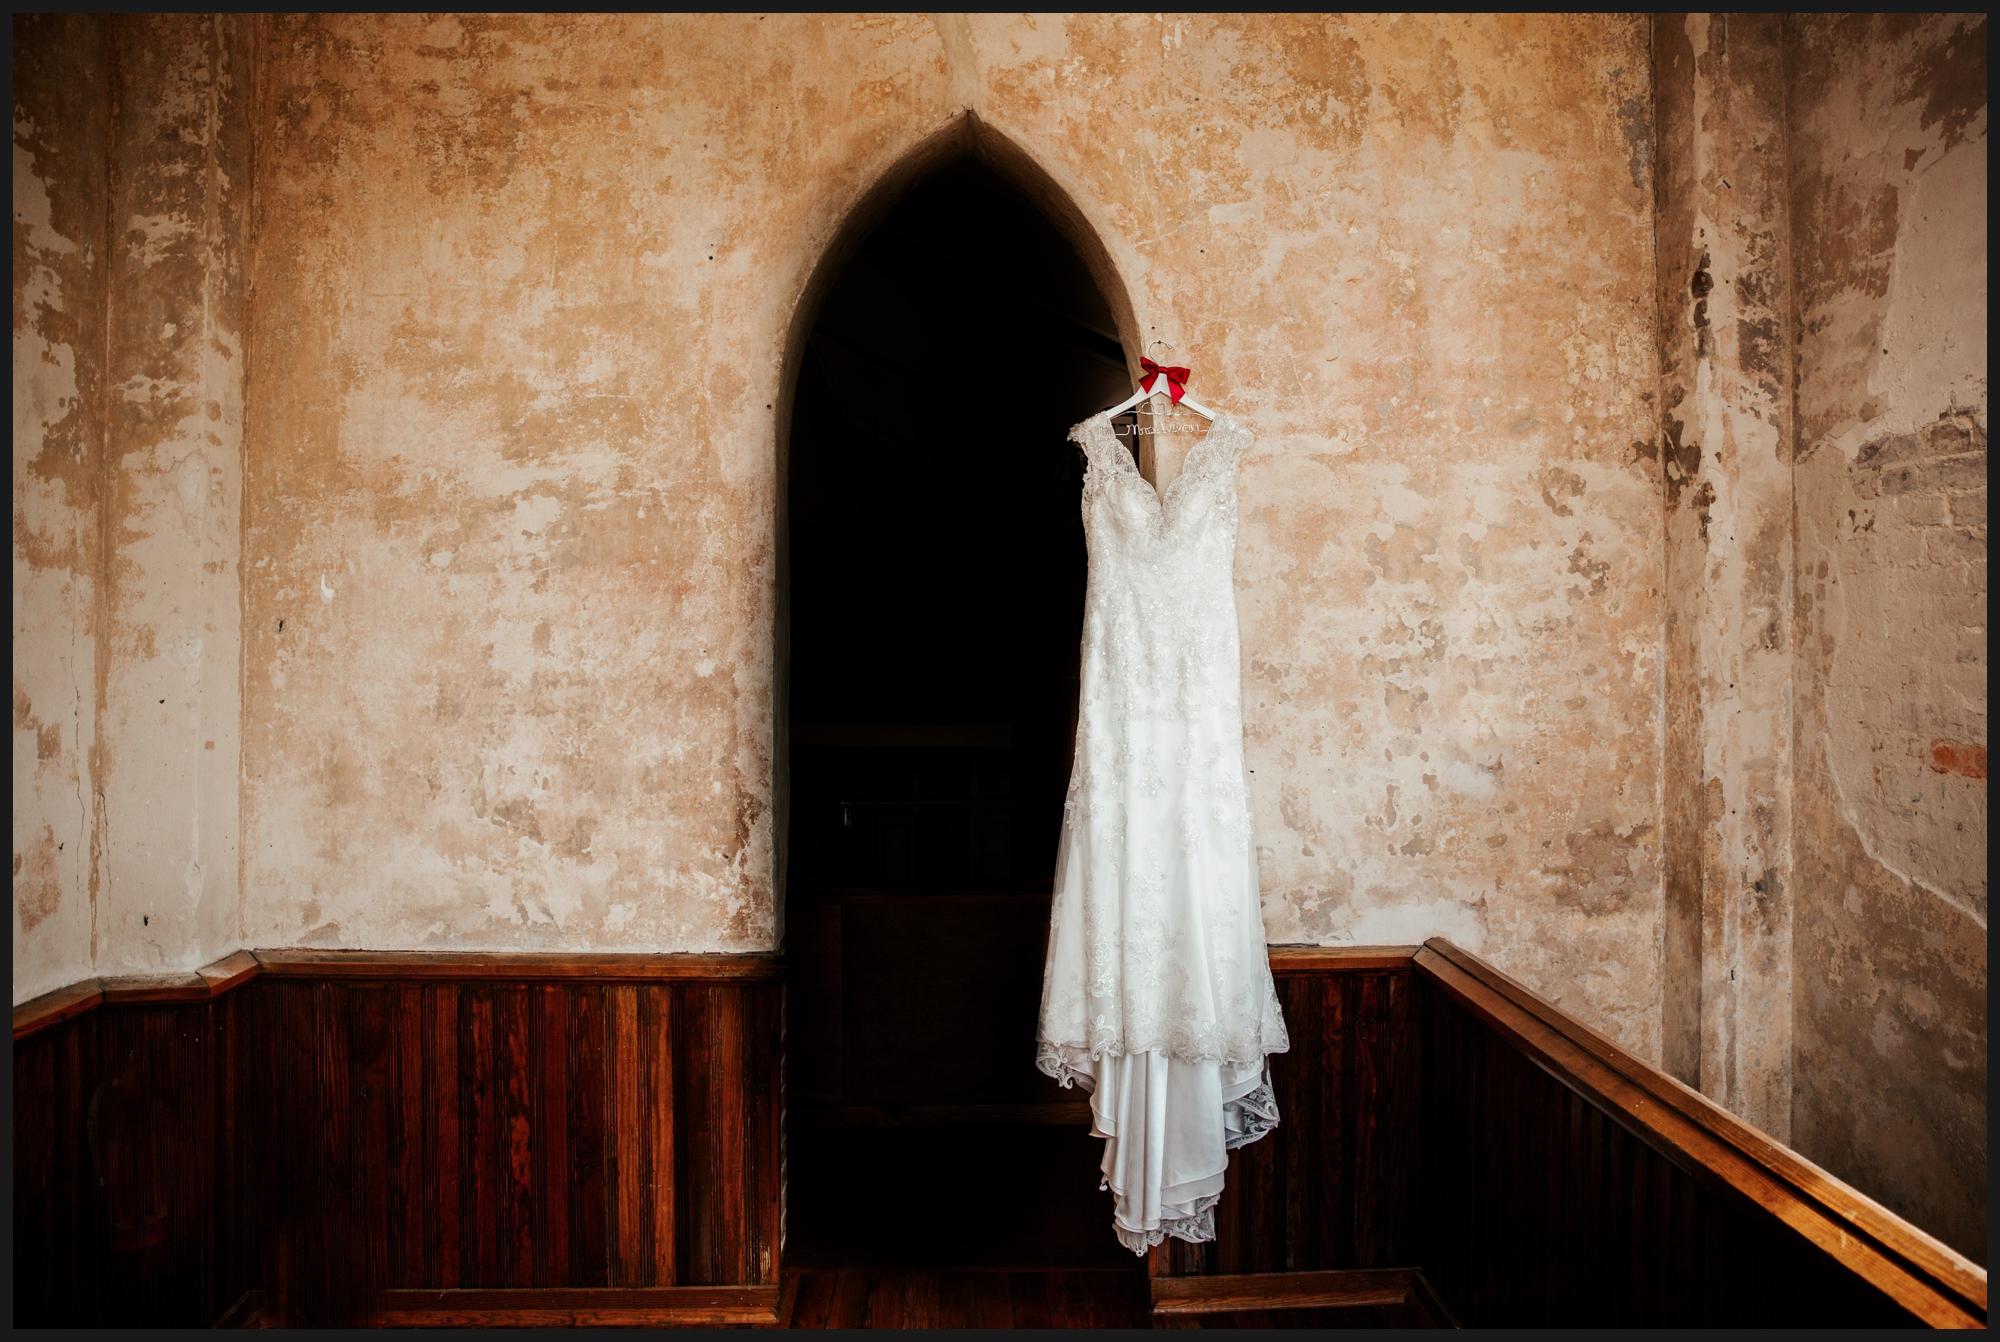 Orlando-Wedding-Photographer-destination-wedding-photographer-florida-wedding-photographer-bohemian-wedding-photographer_0571.jpg